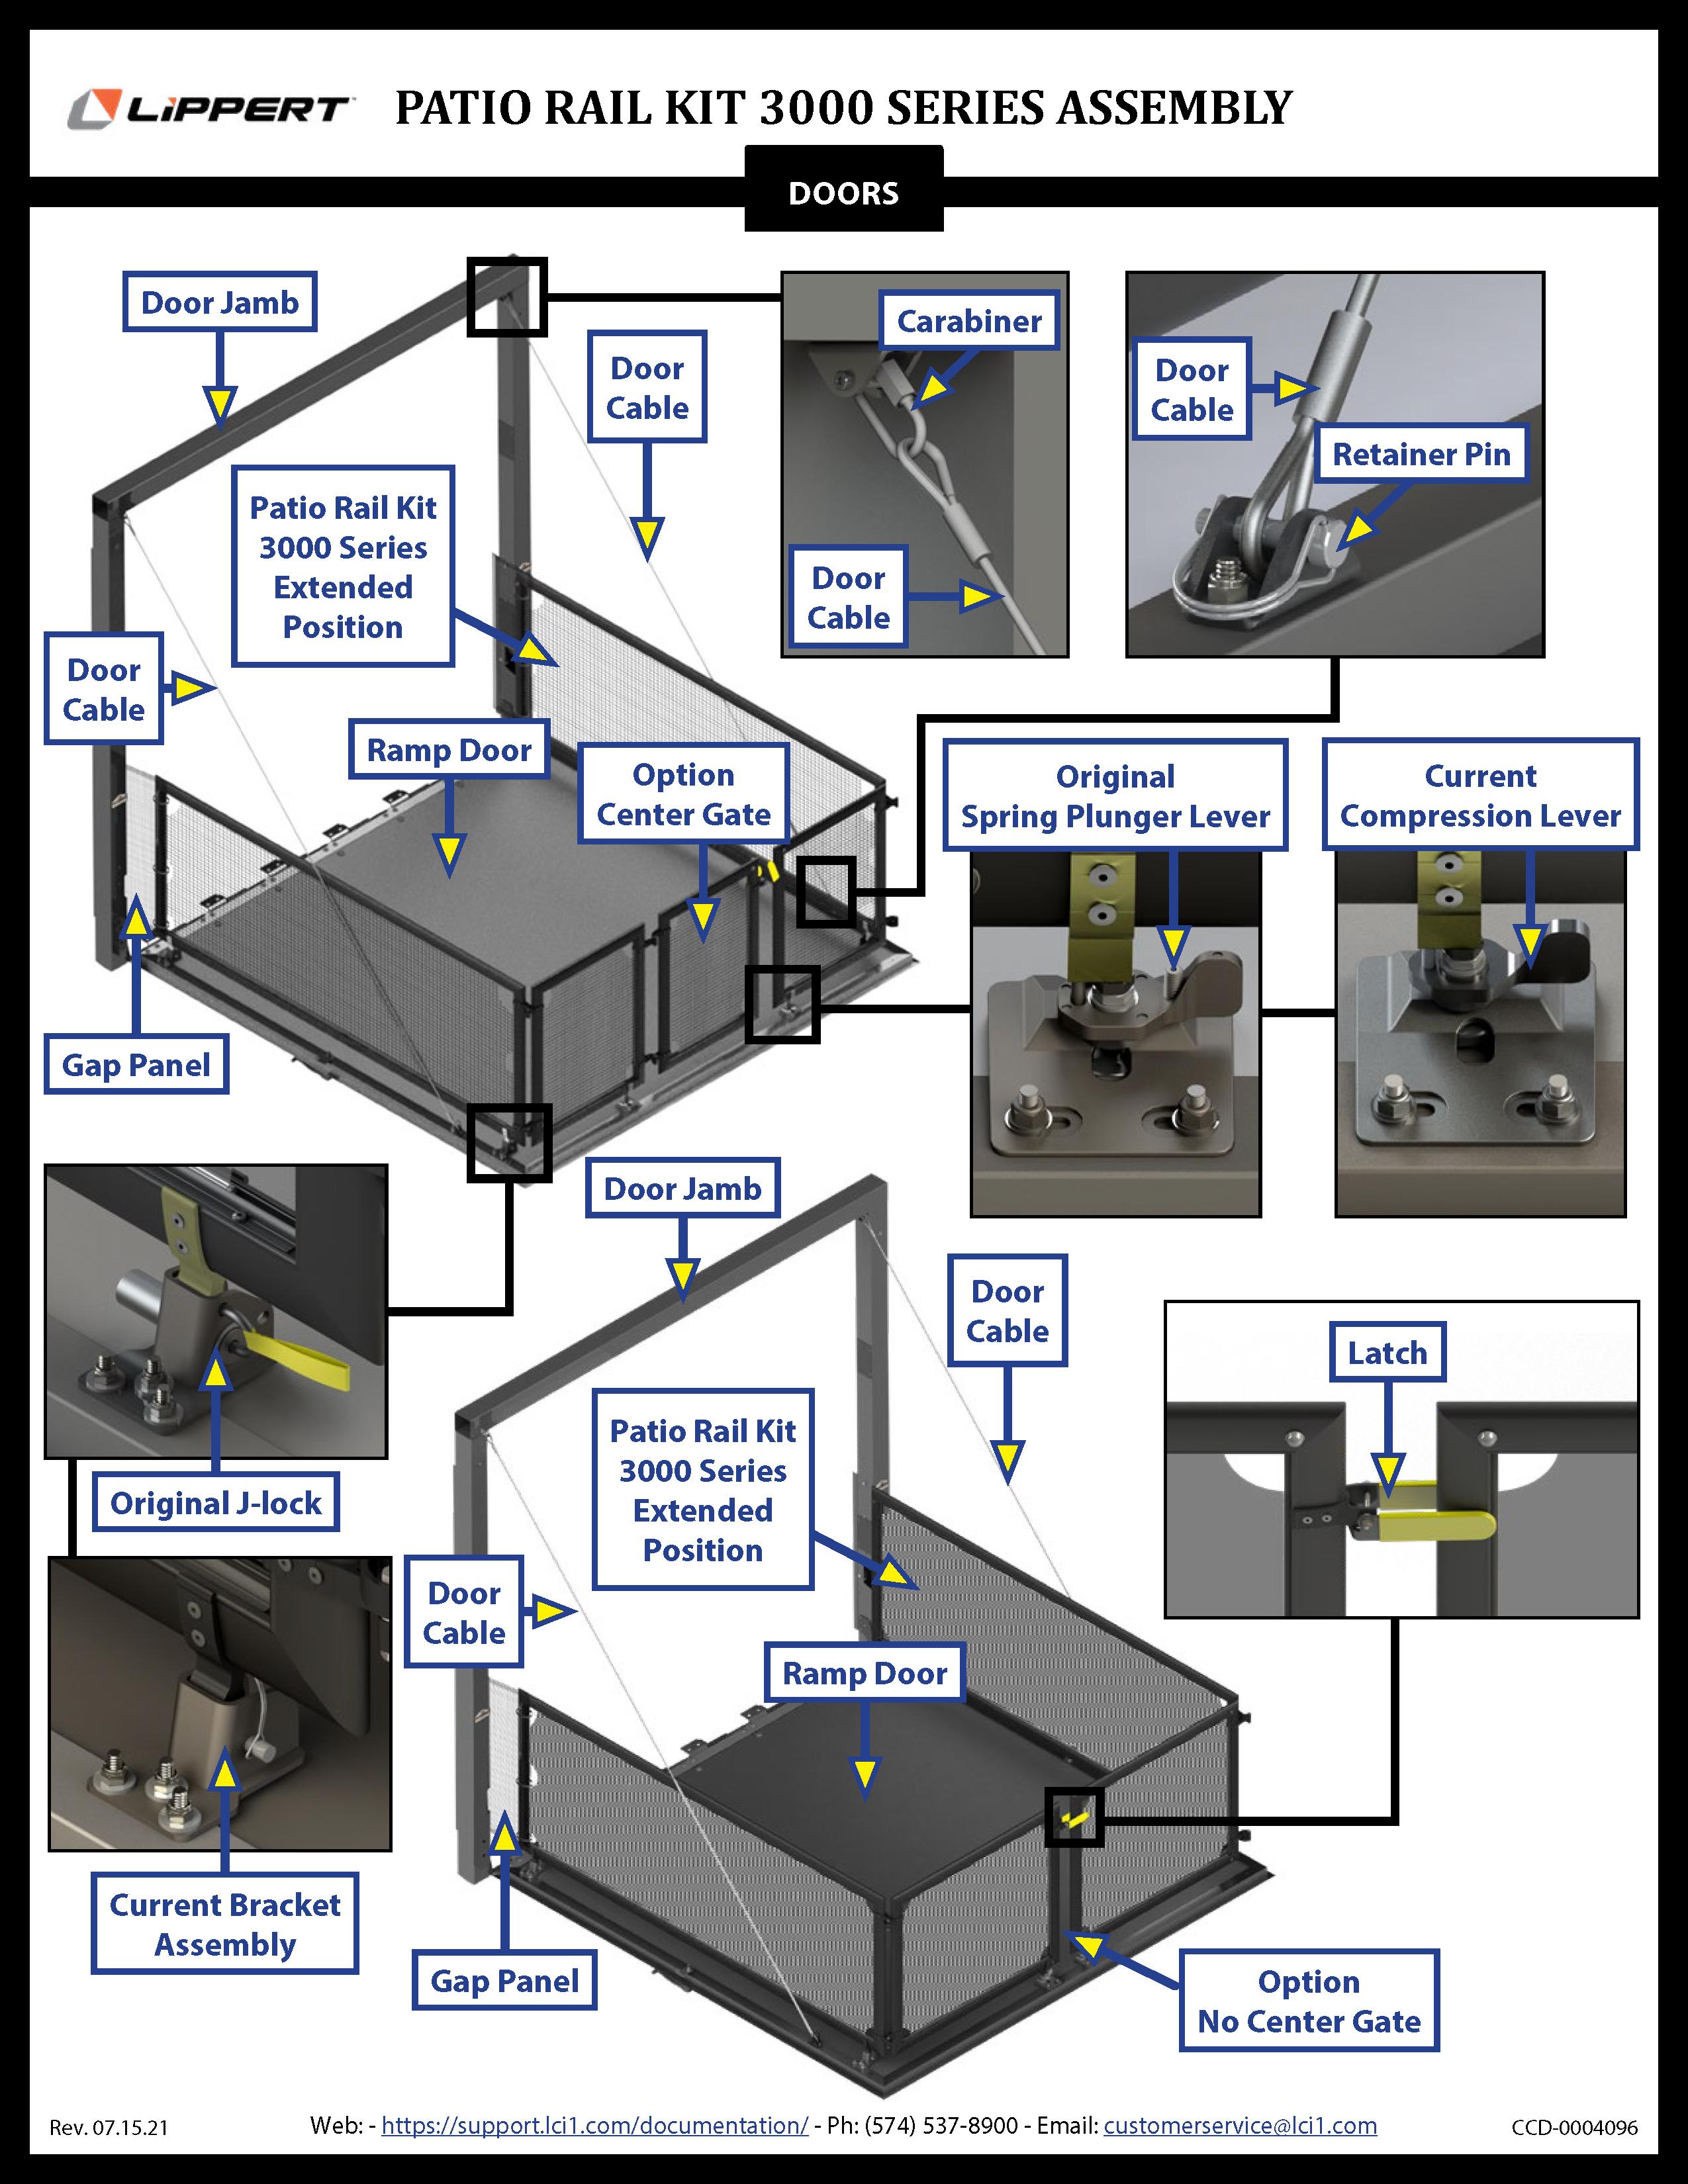 Patio Rail Kit 3000 Series Assembly